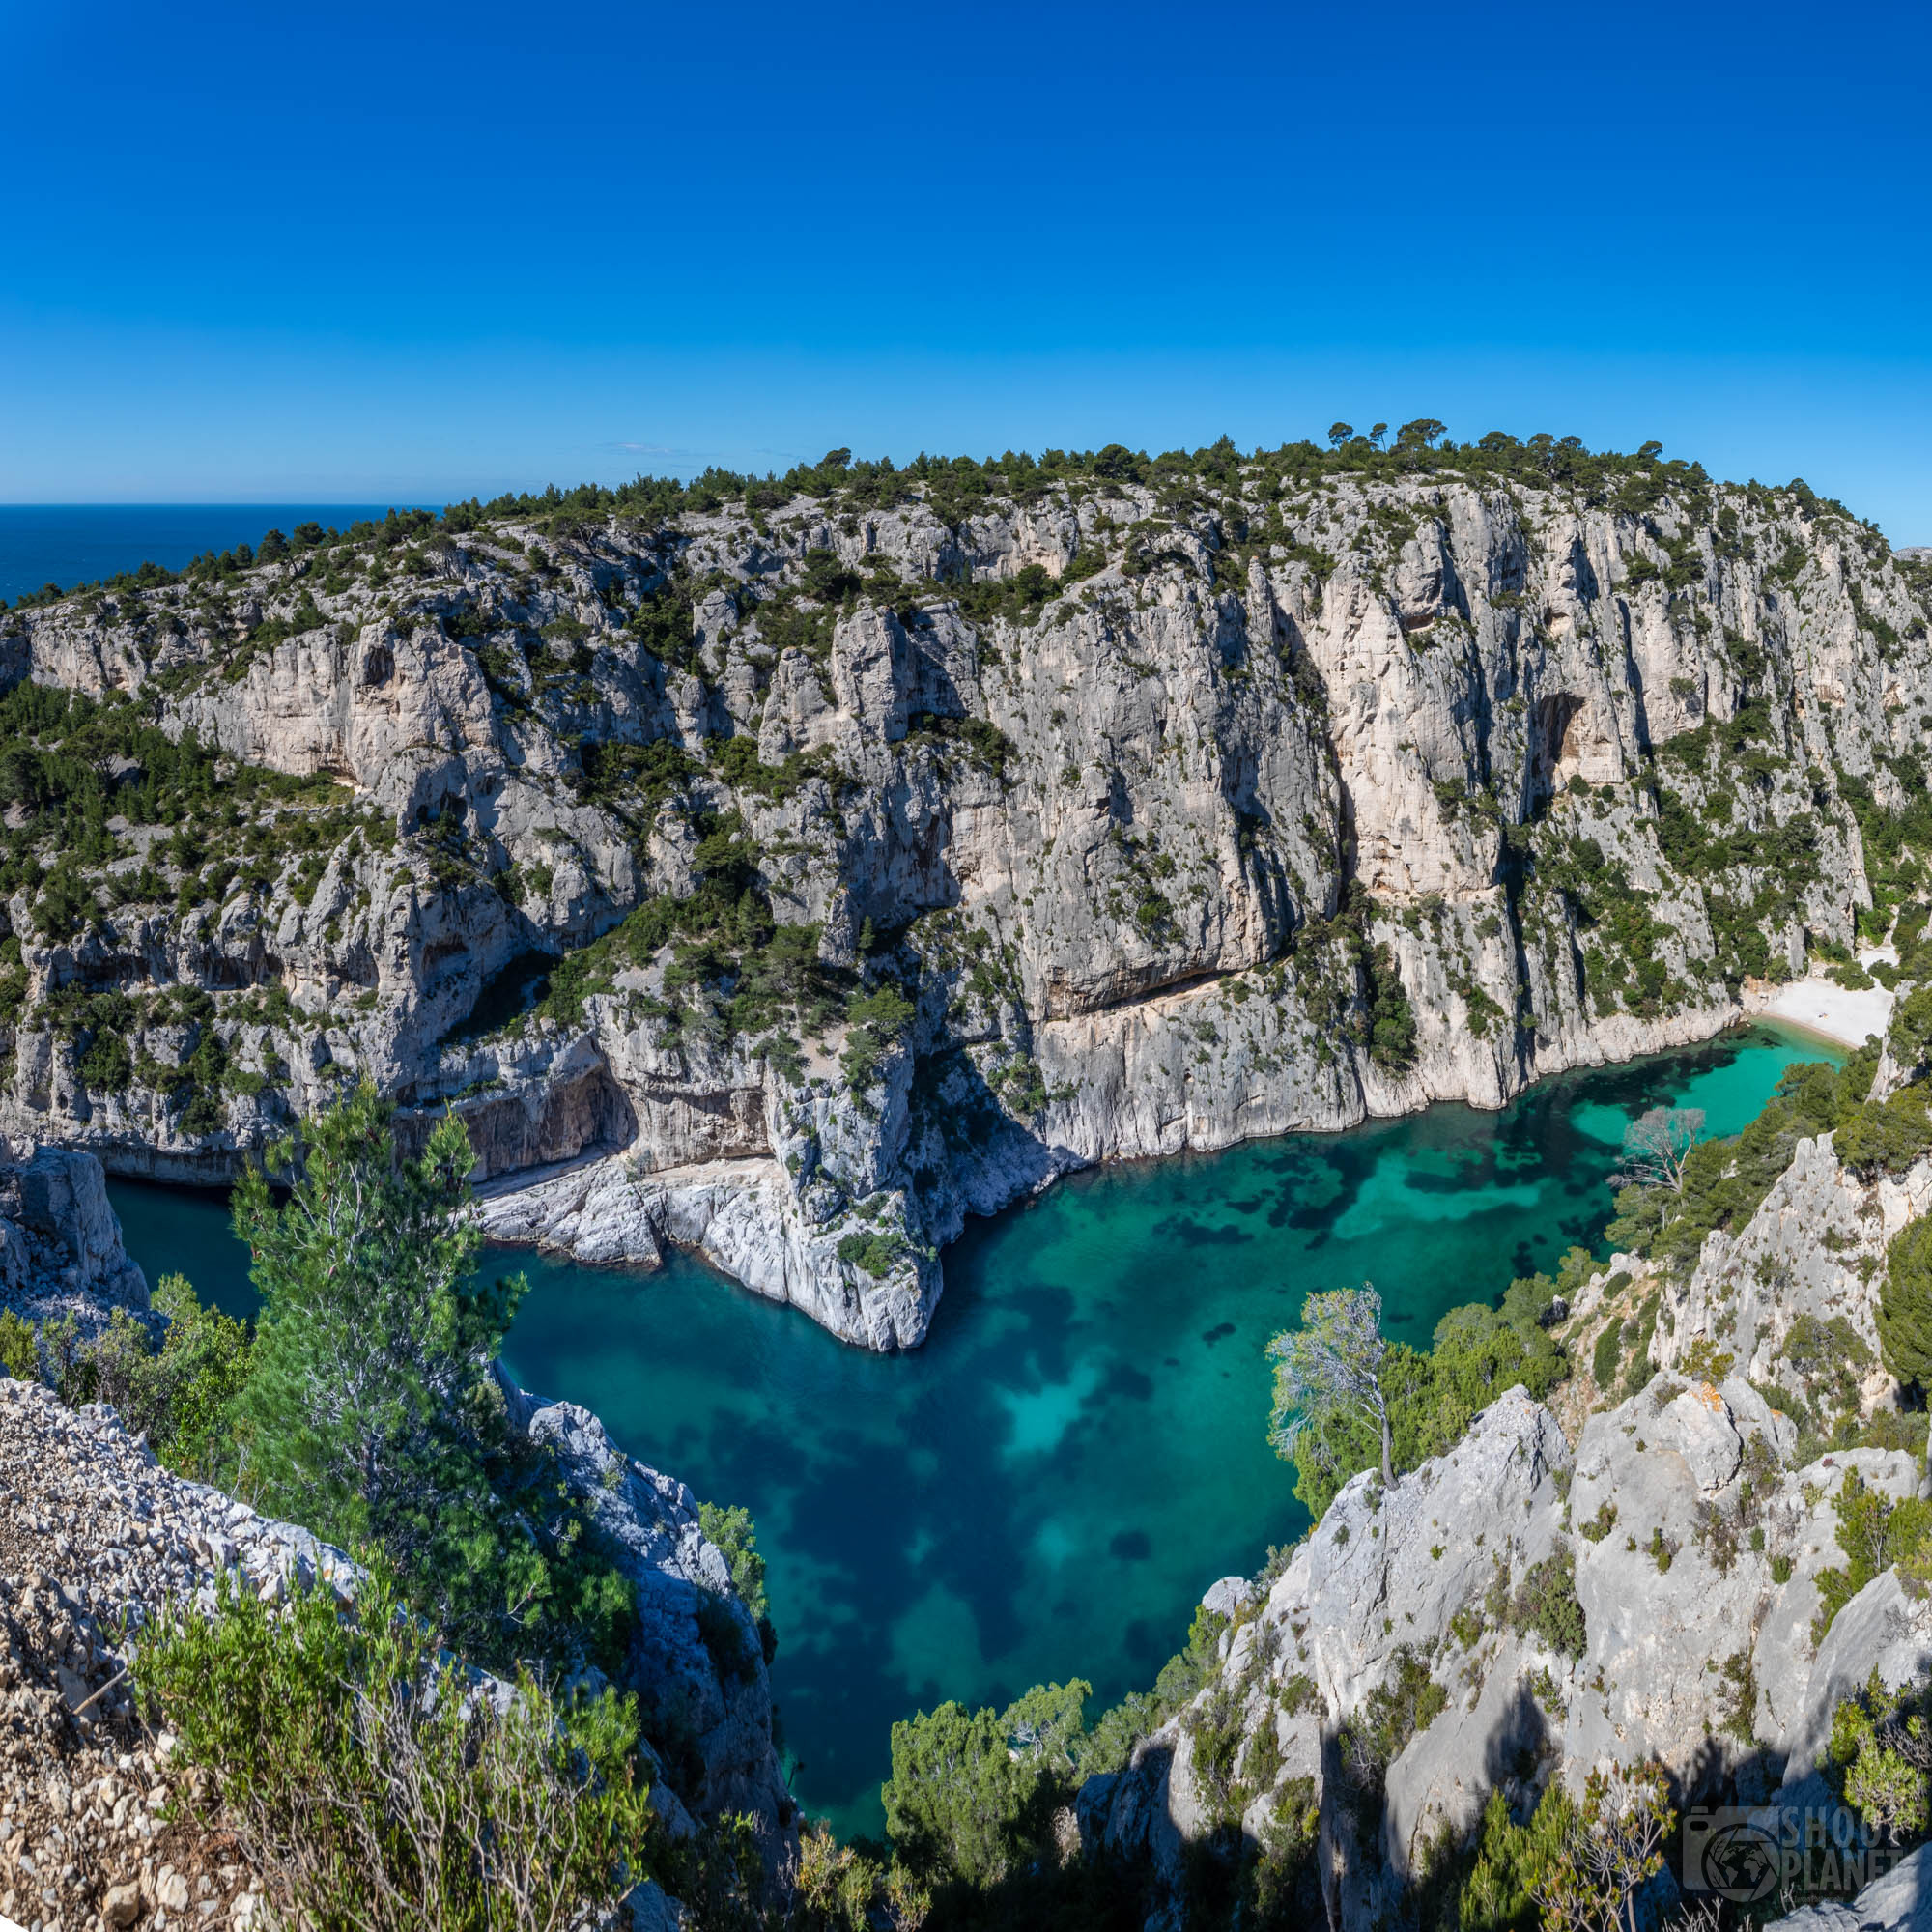 En-Vau calanque aerial view, Azure coast France